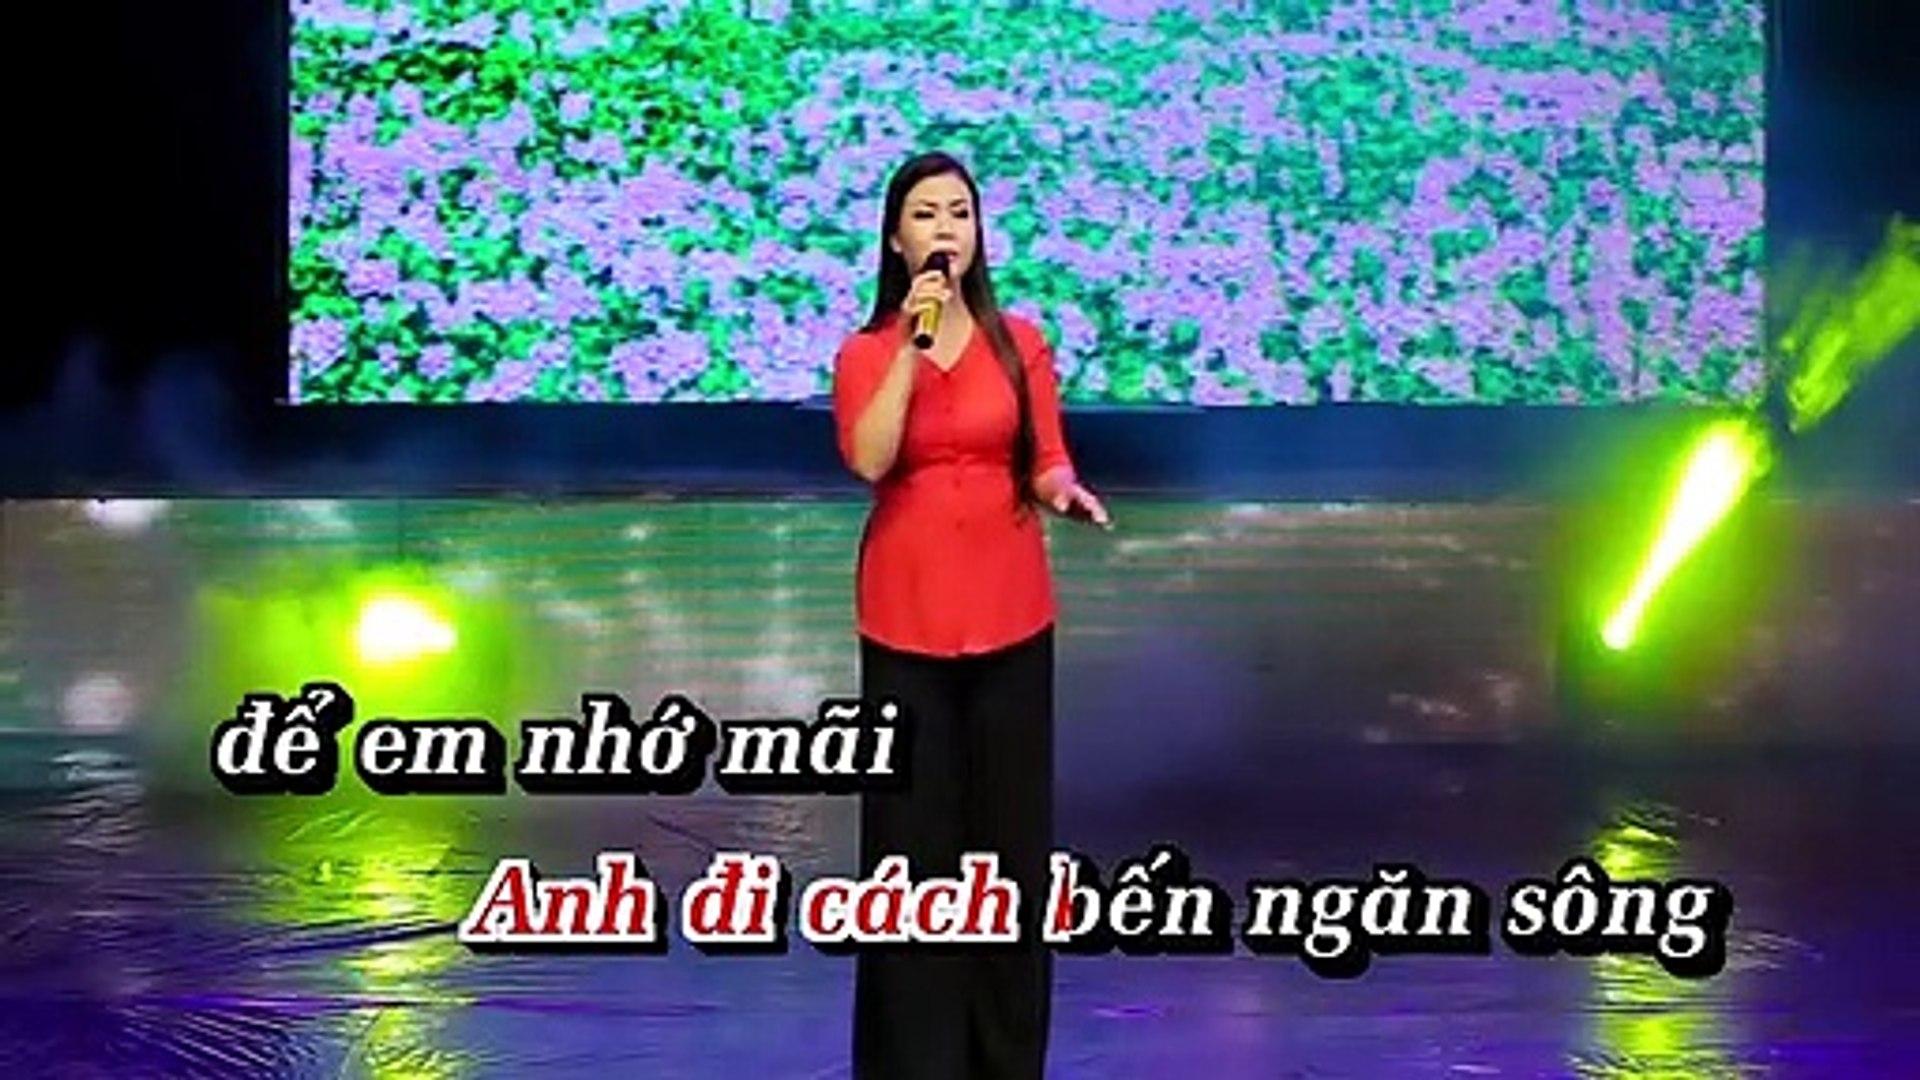 [Karaoke] Hoa Tím Lục Bình - Dương Hồng Loan [Beat]